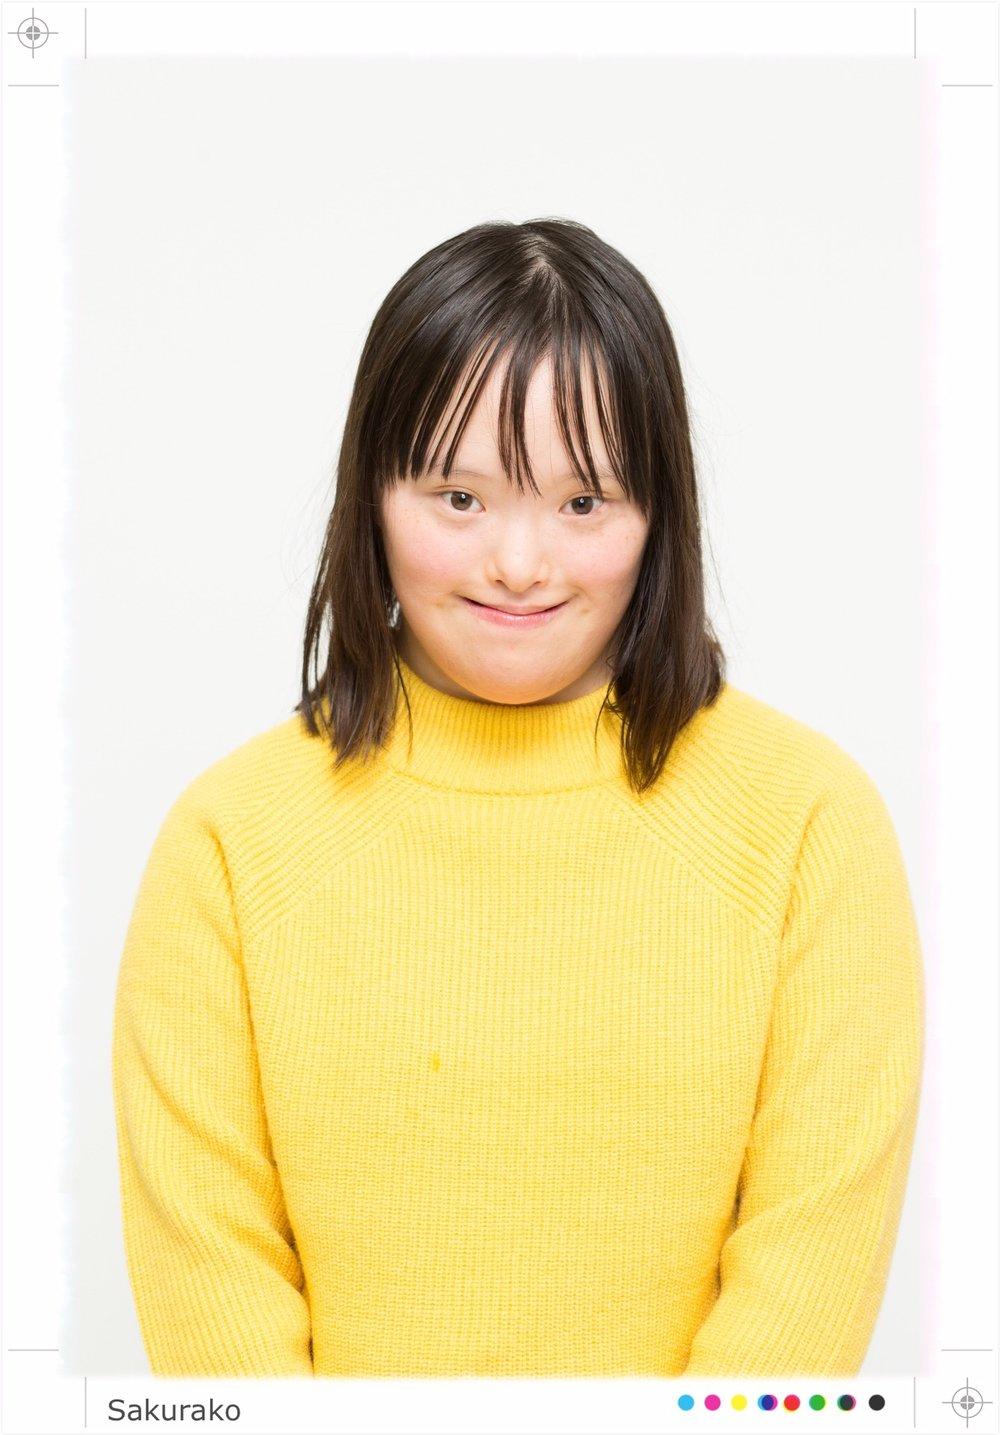 Sakurako さくらこ - きれいなドレスを着たいので応募しました!I wanted to wear a beautiful dress so I entered this contest!